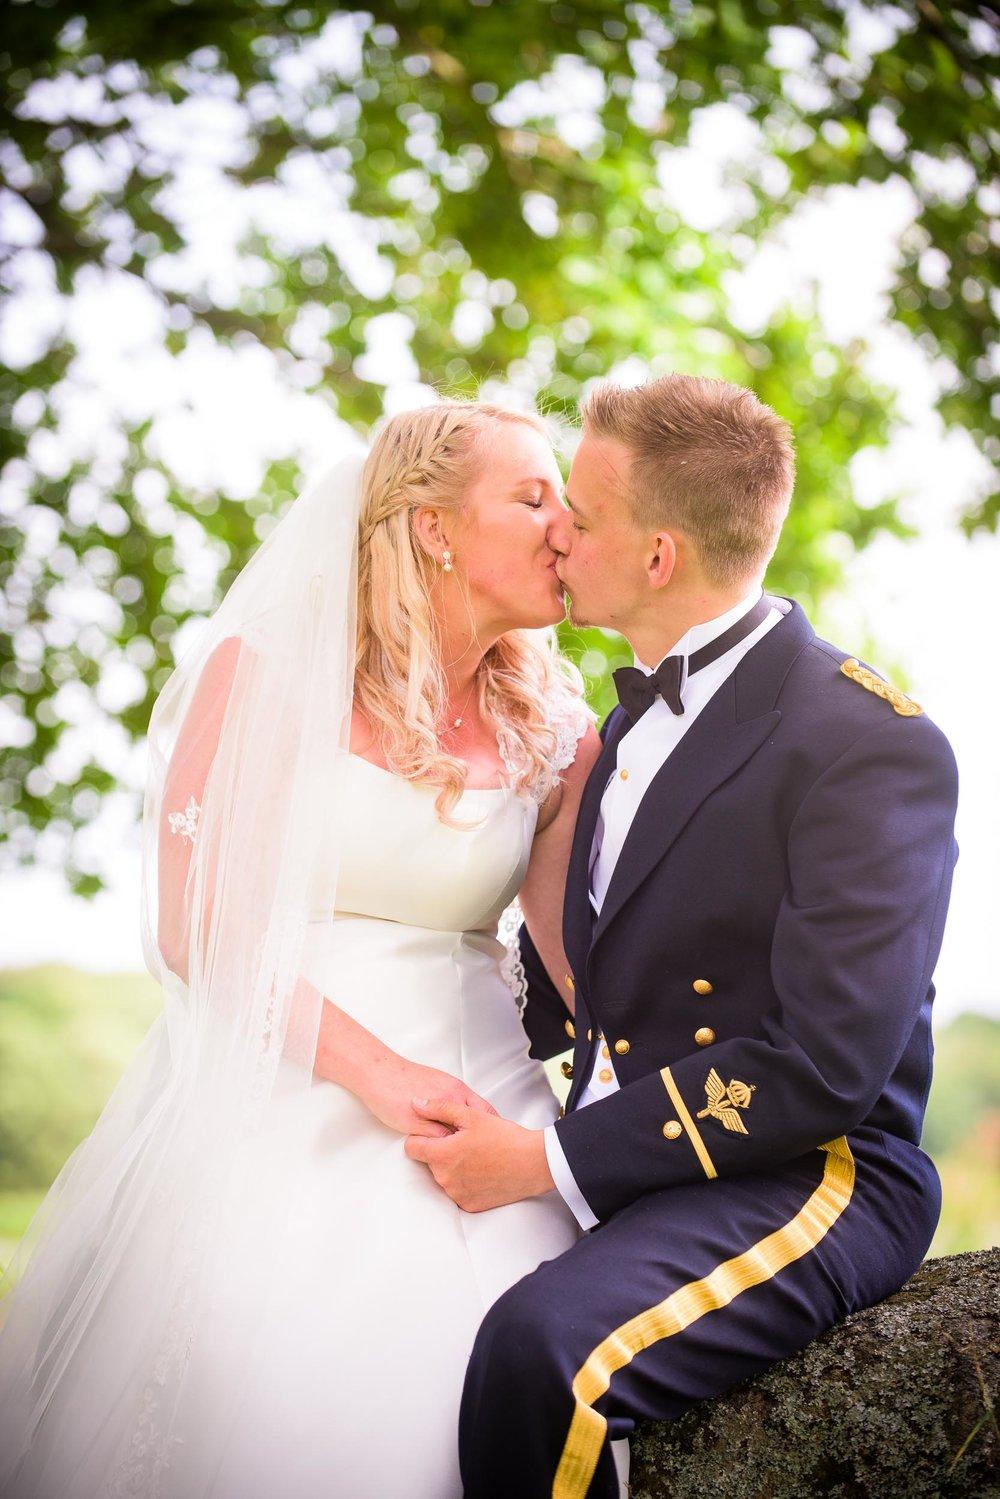 bröllopsfoto-Hässleholm-juli17-4.jpg